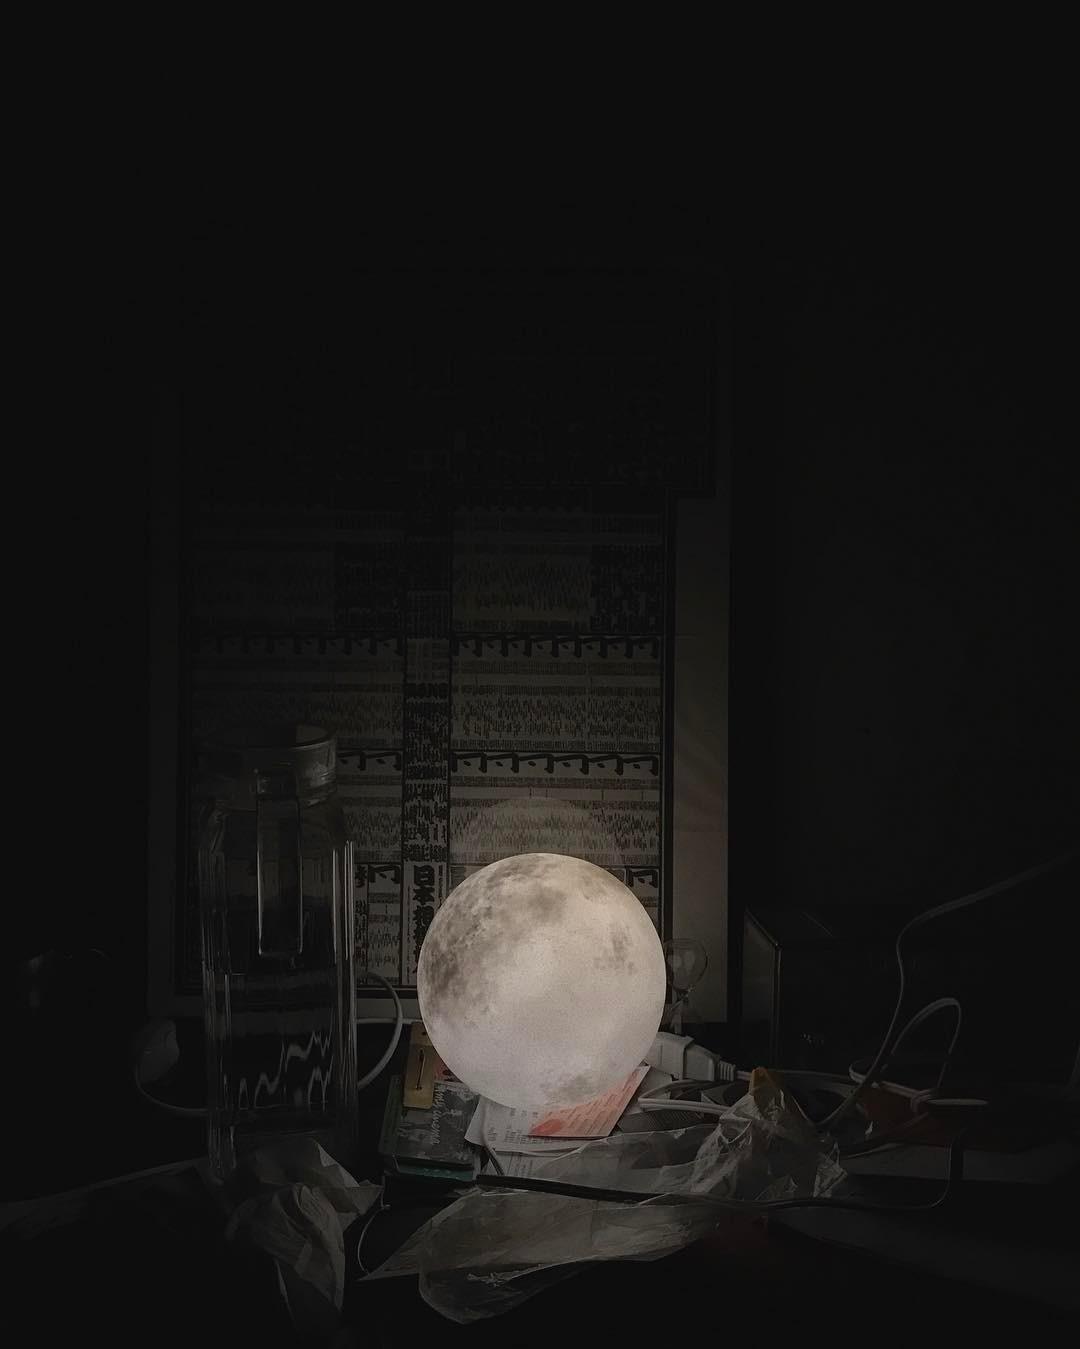 #lunalamp#月球燈luna #月亮燈#acornartstudio  photo by @liwingyannn